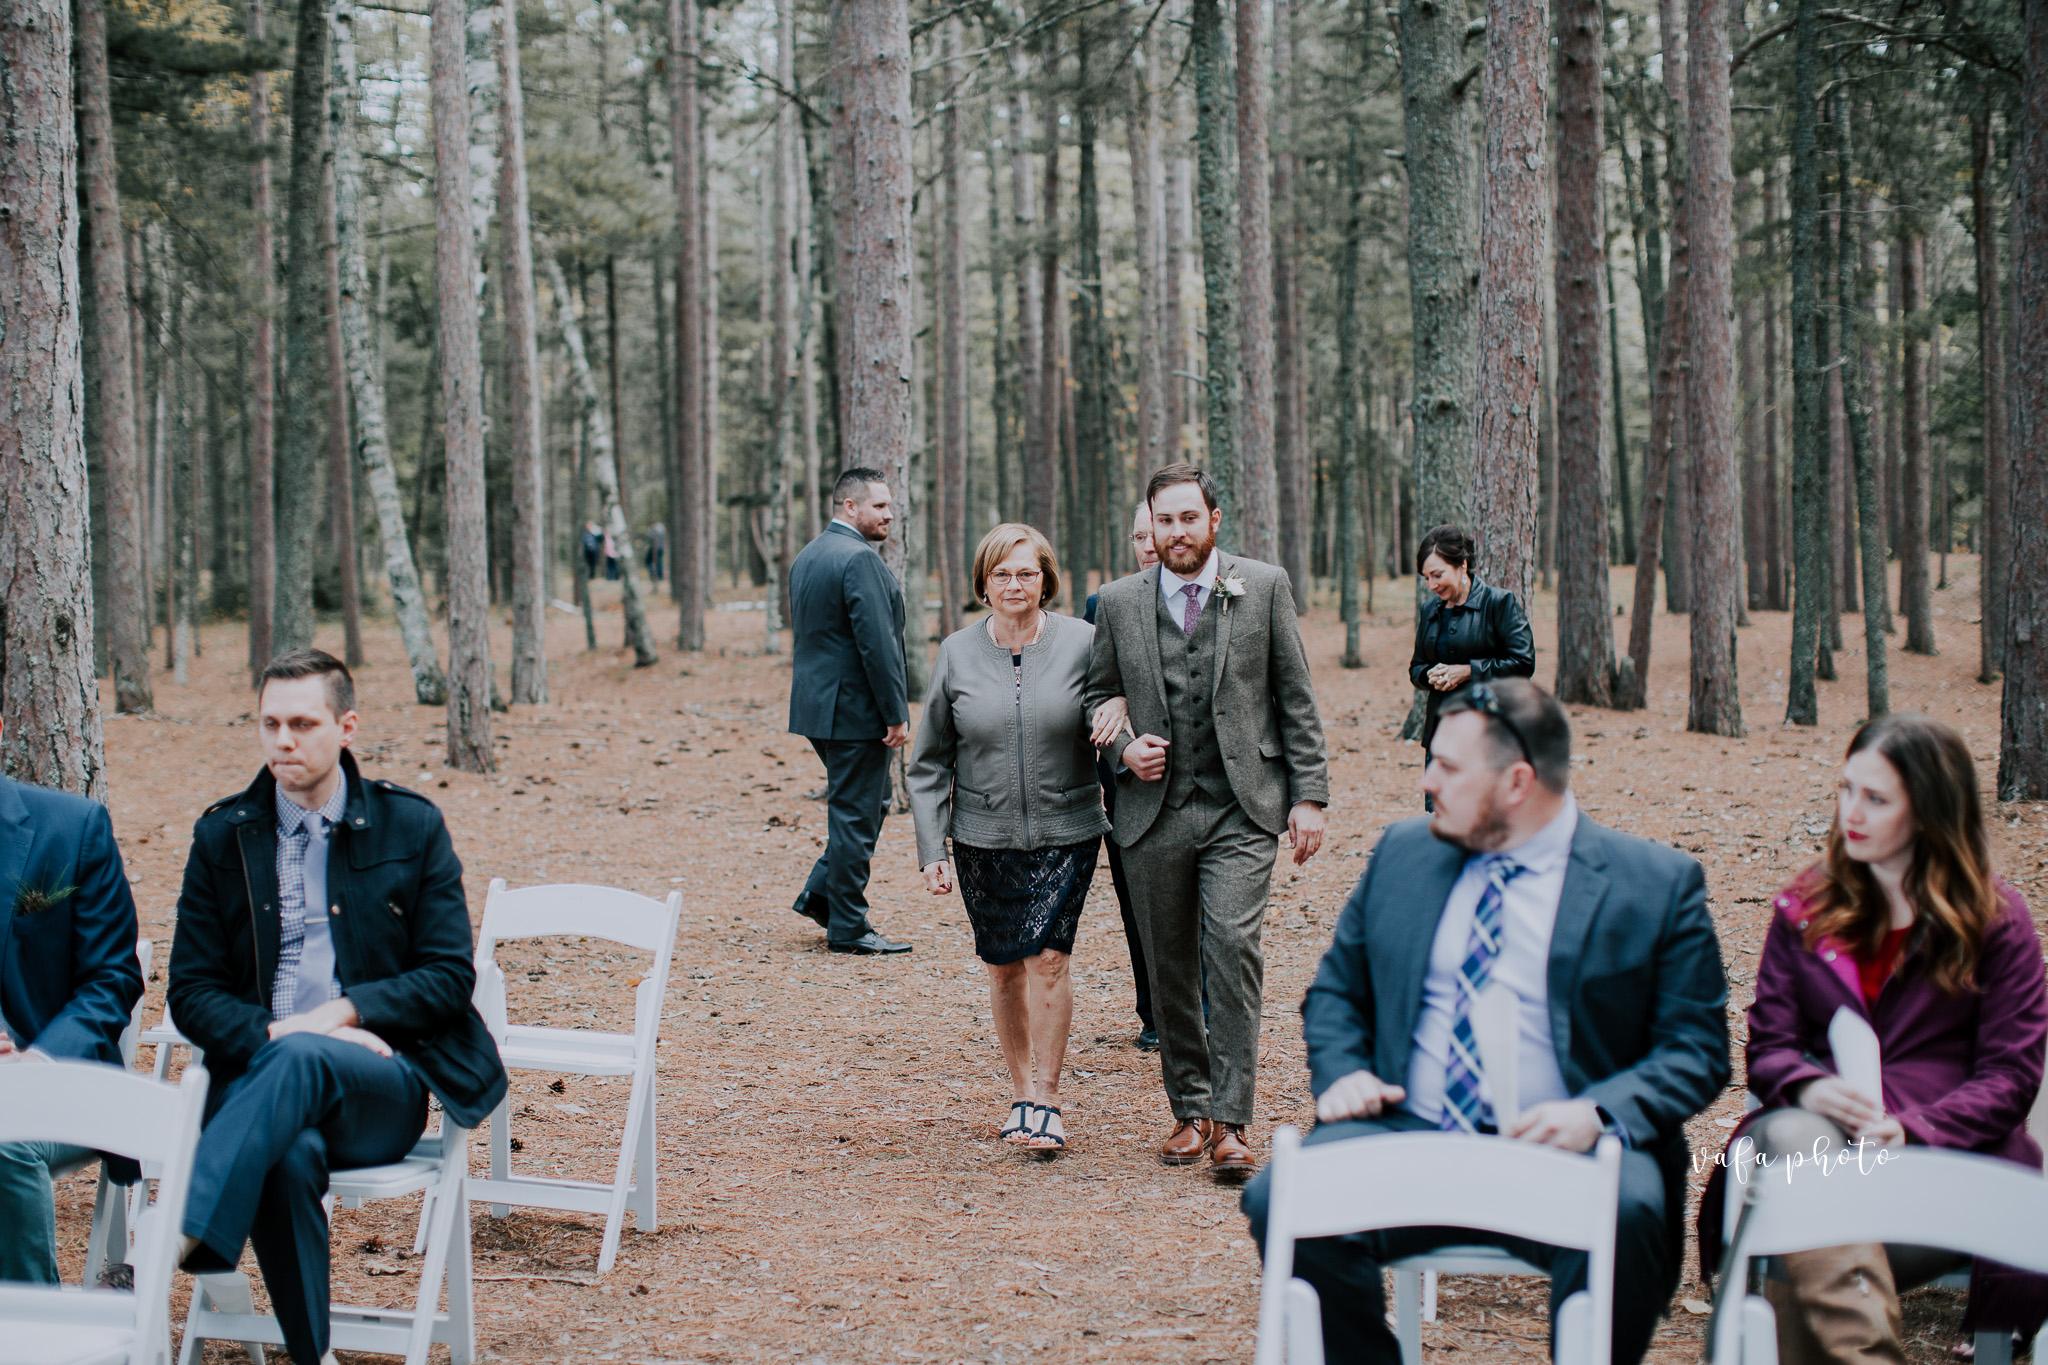 Little-Presque-Isle-Michigan-Wedding-Kim-Kyle-Vafa-Photo-167.jpg